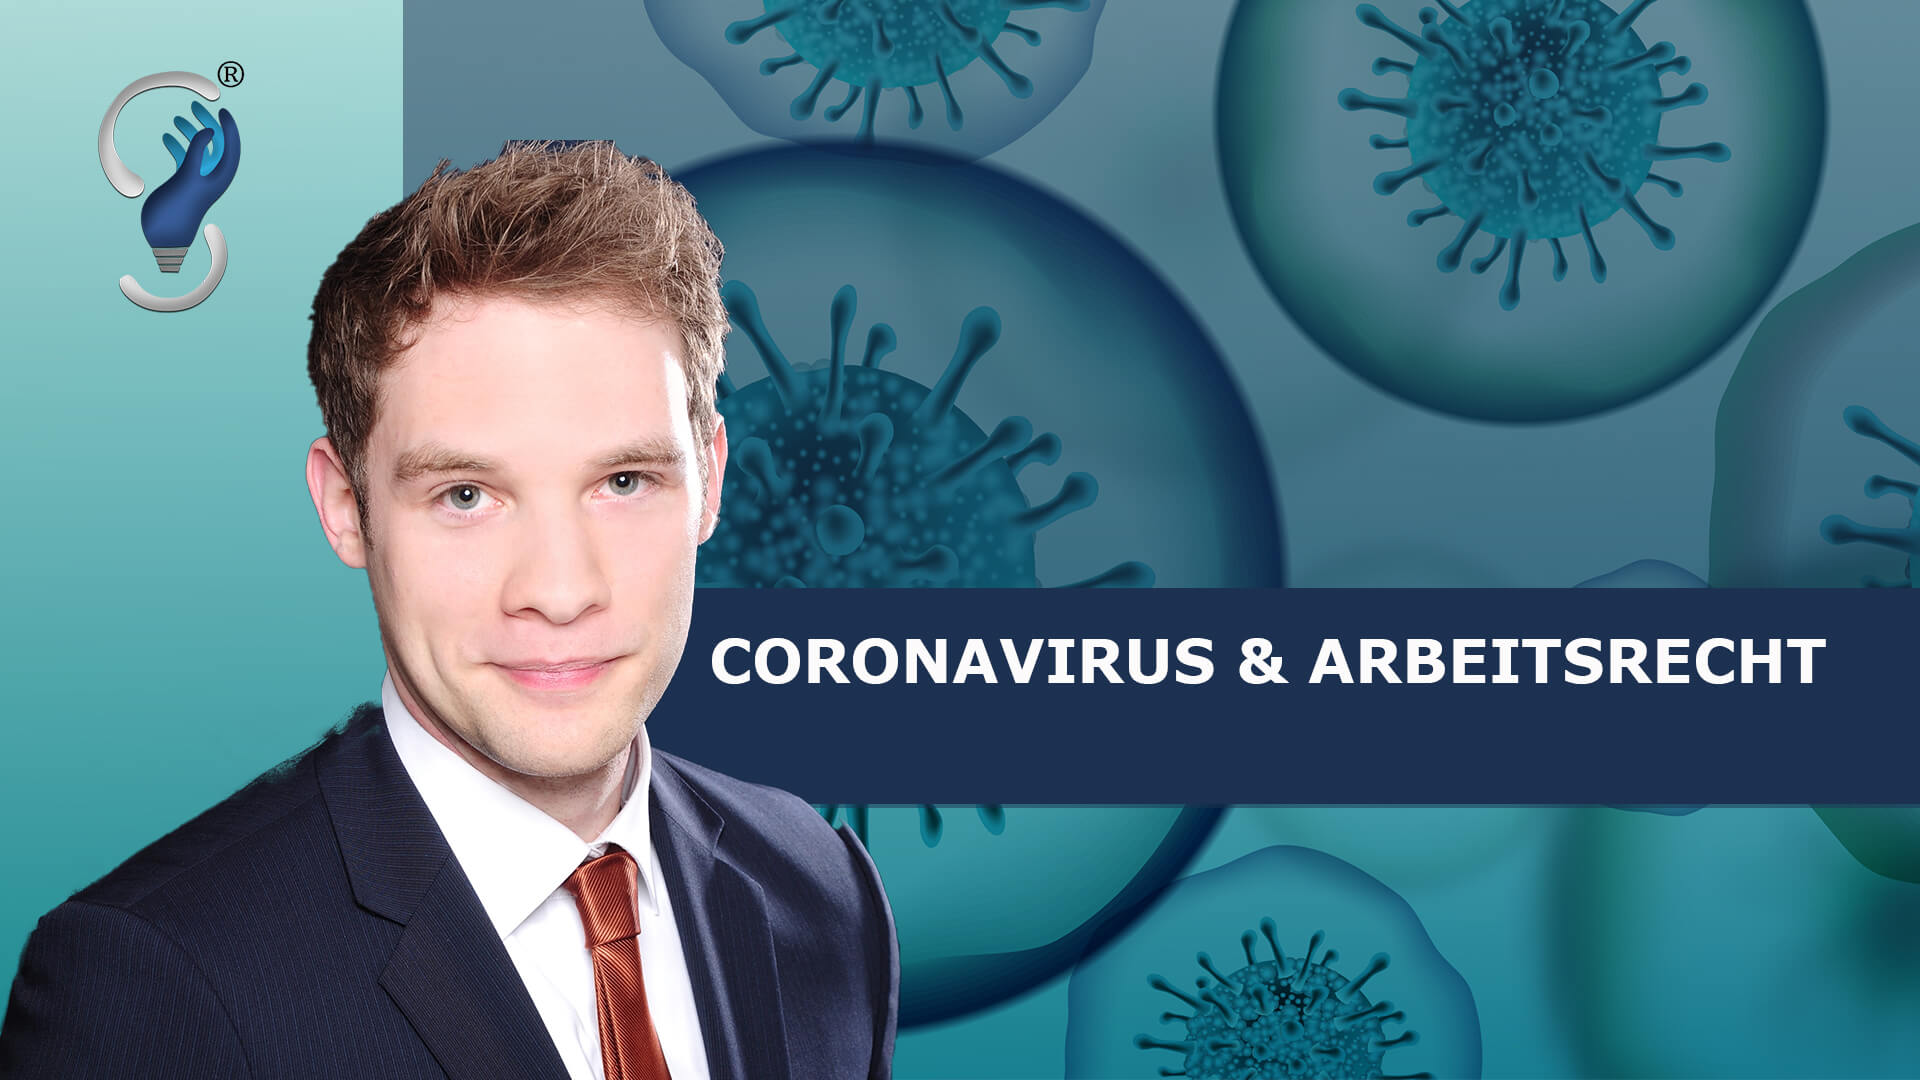 Corona Coronavirus Covid19 Anwalt Rechtsanwalt Arbeitsrecht Arbeitnehmer Arbeitgeber